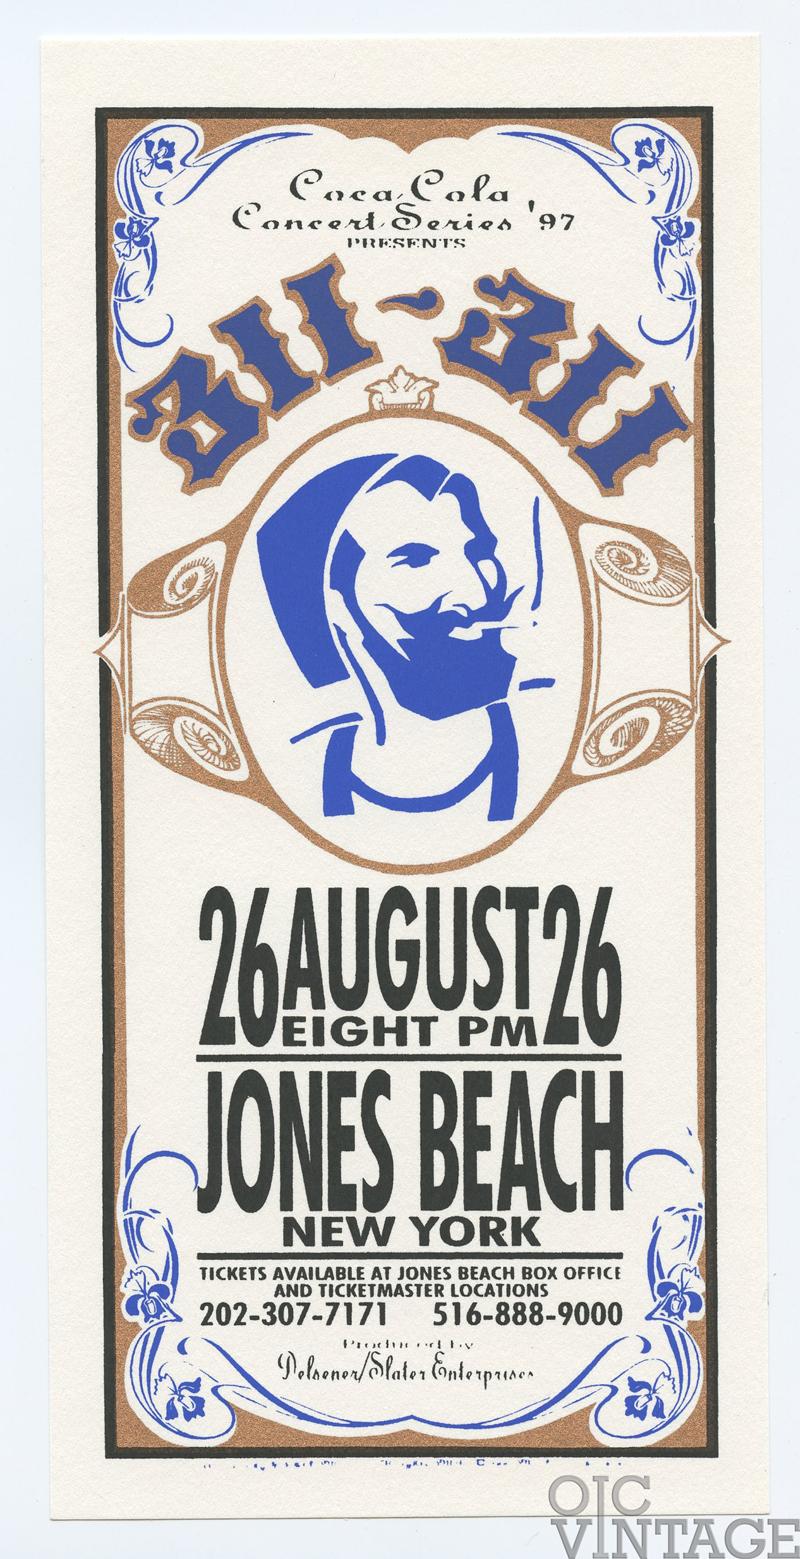 311 Handbill Jones Beach New York 1997 Aug 26 AOMR 080.5